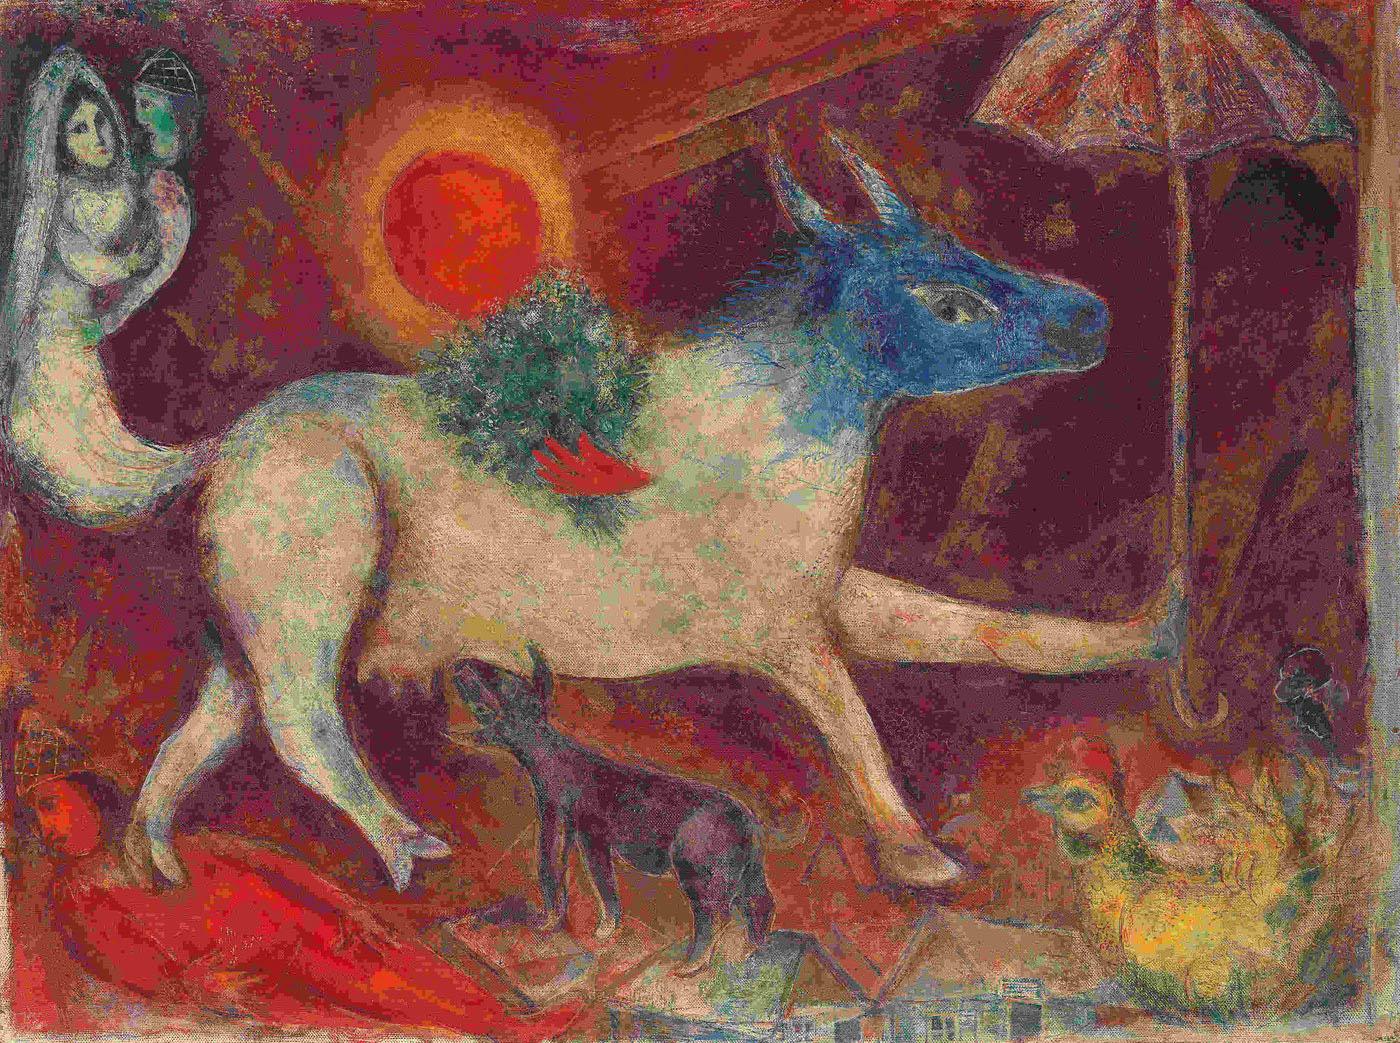 Шагал ((картины( La-mucca-con-ombrello-1946-olio-su-tela-web